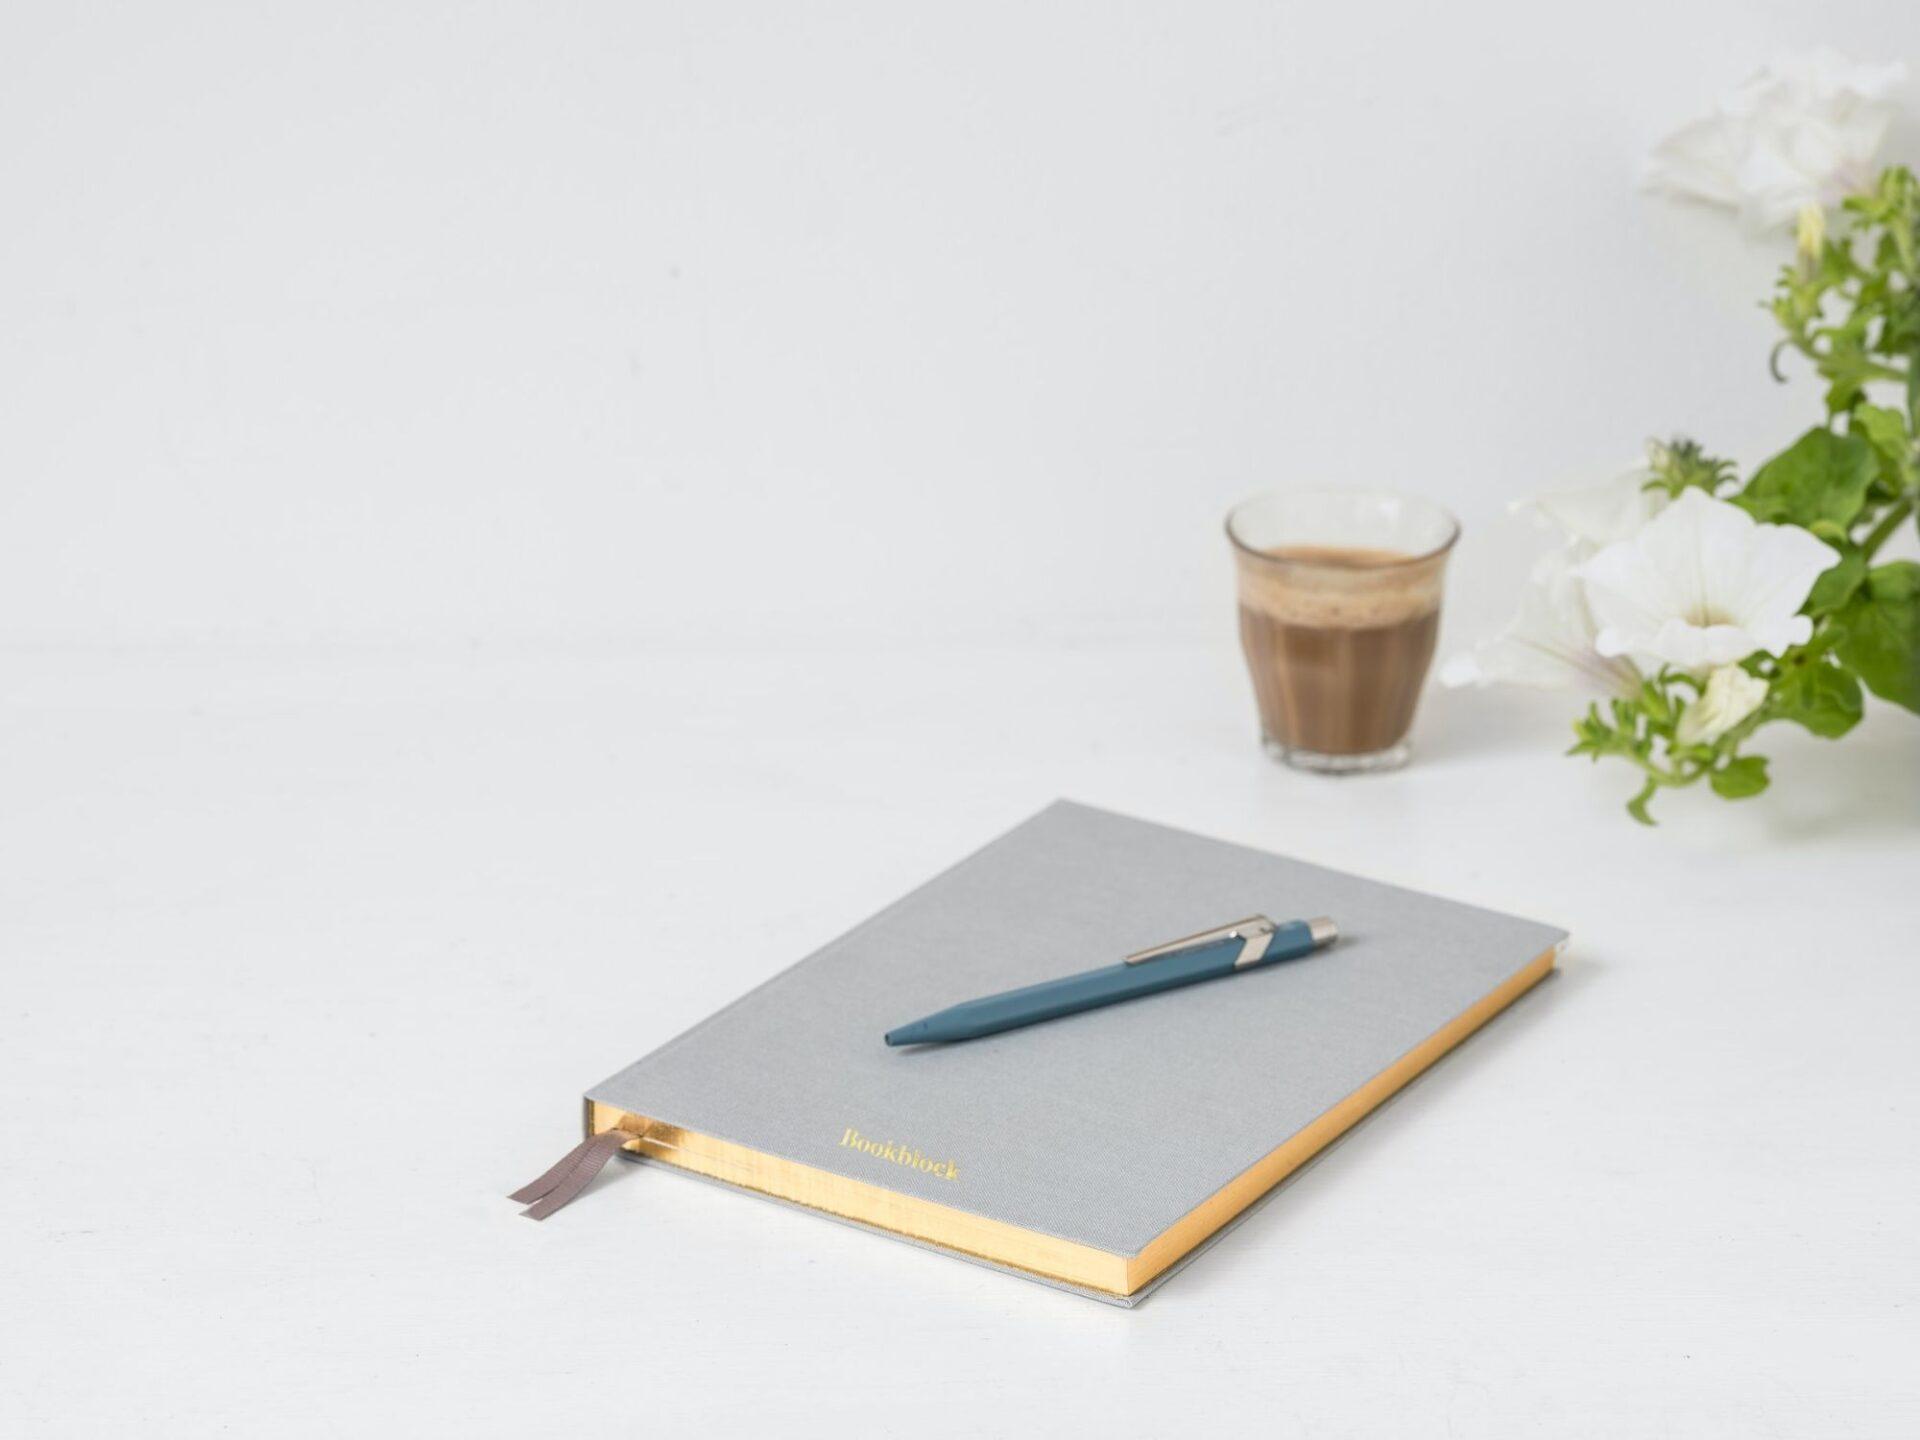 perfectionisme loslaten